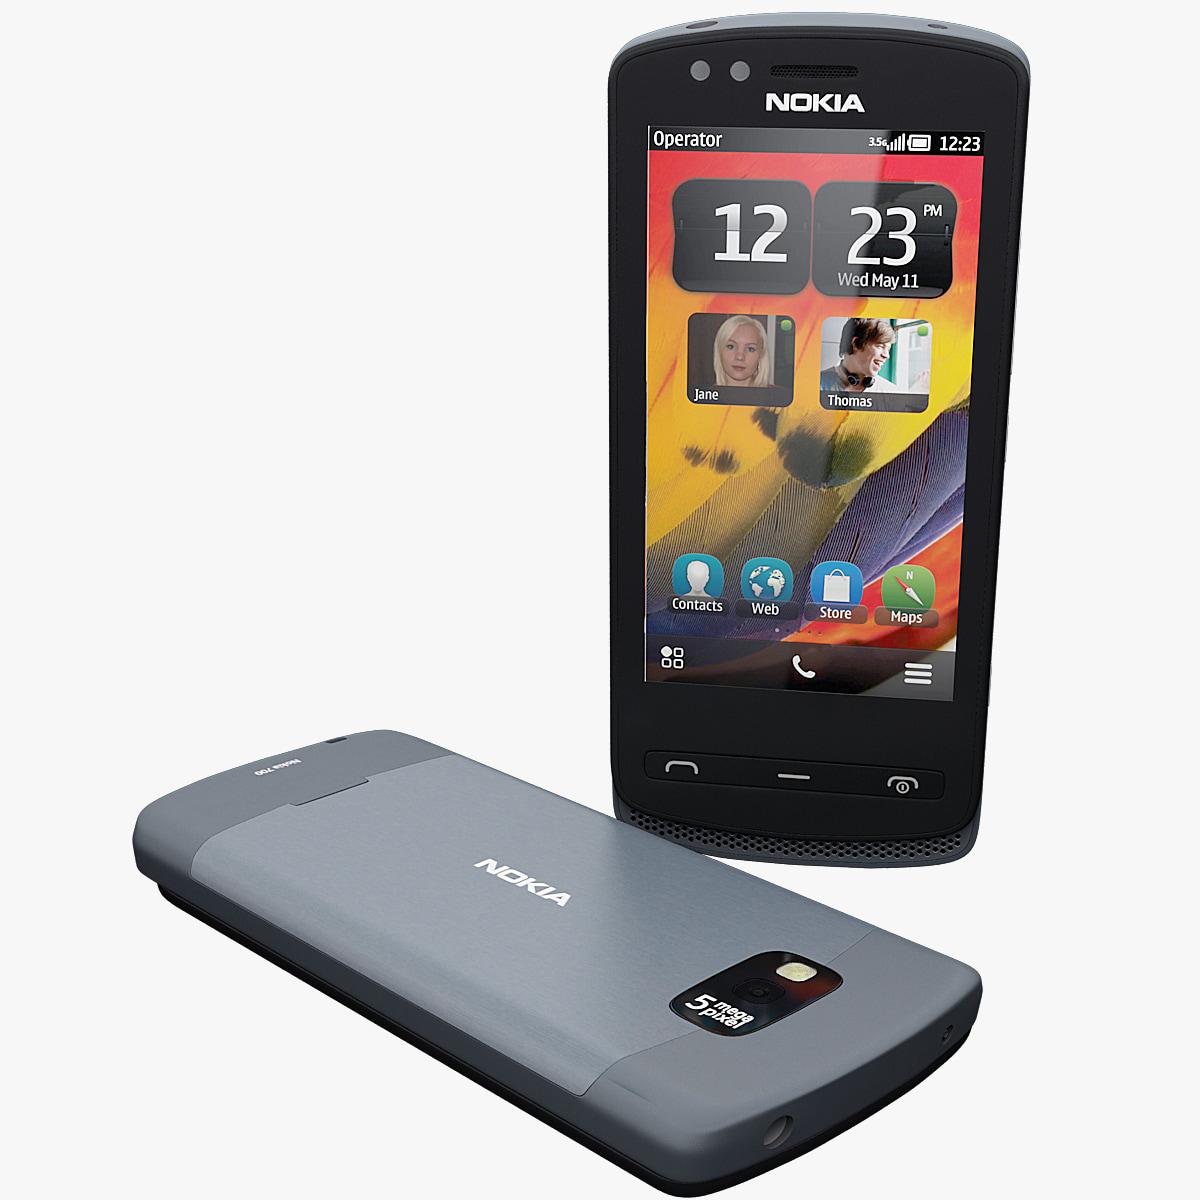 Nokia_700_Zeta_Black_Vray.jpg